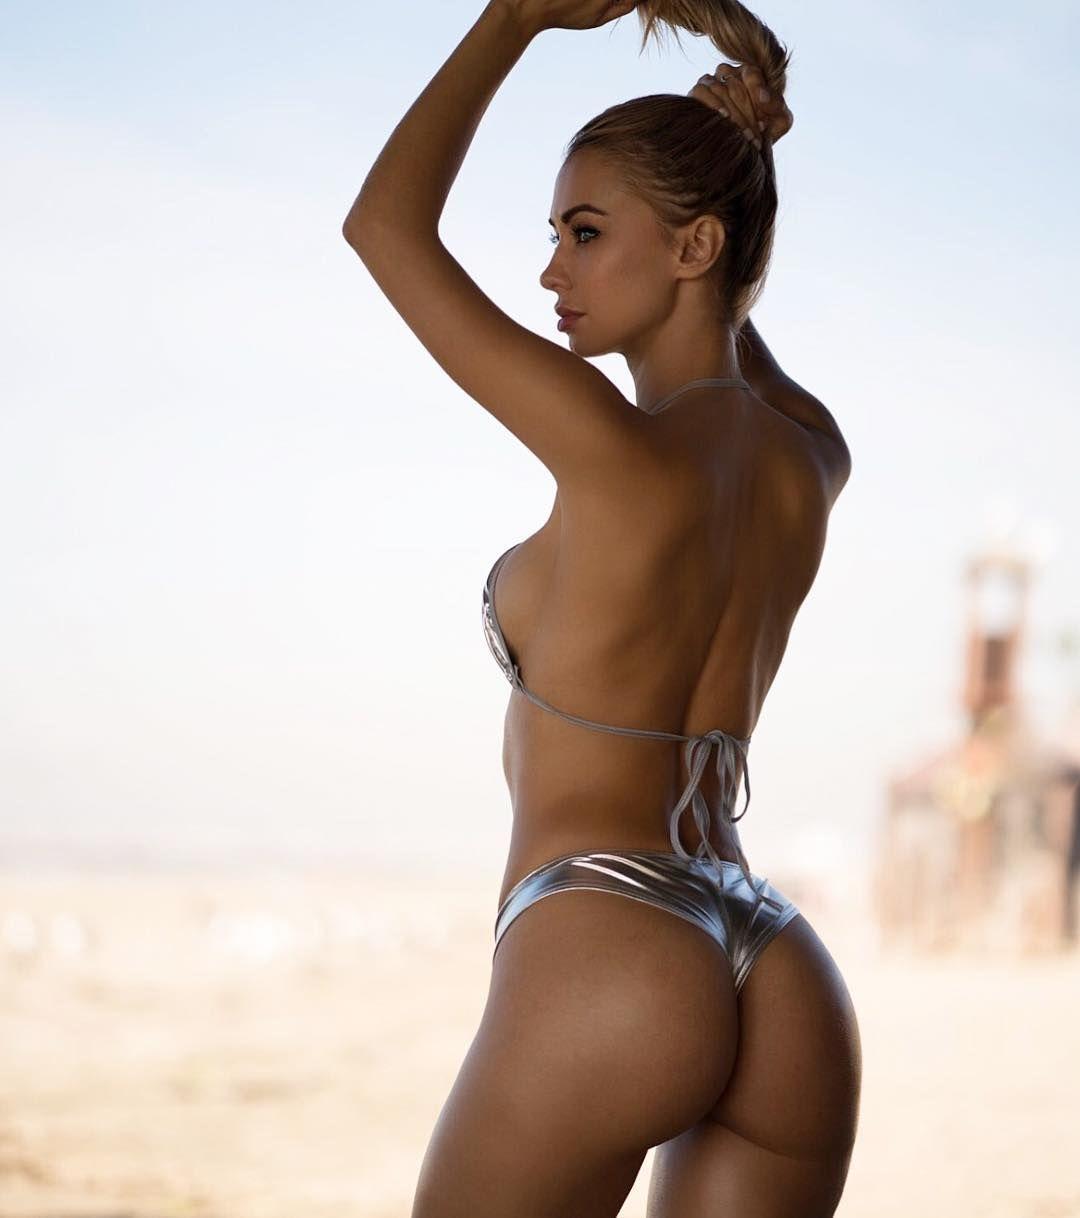 Hot nude girl on atv